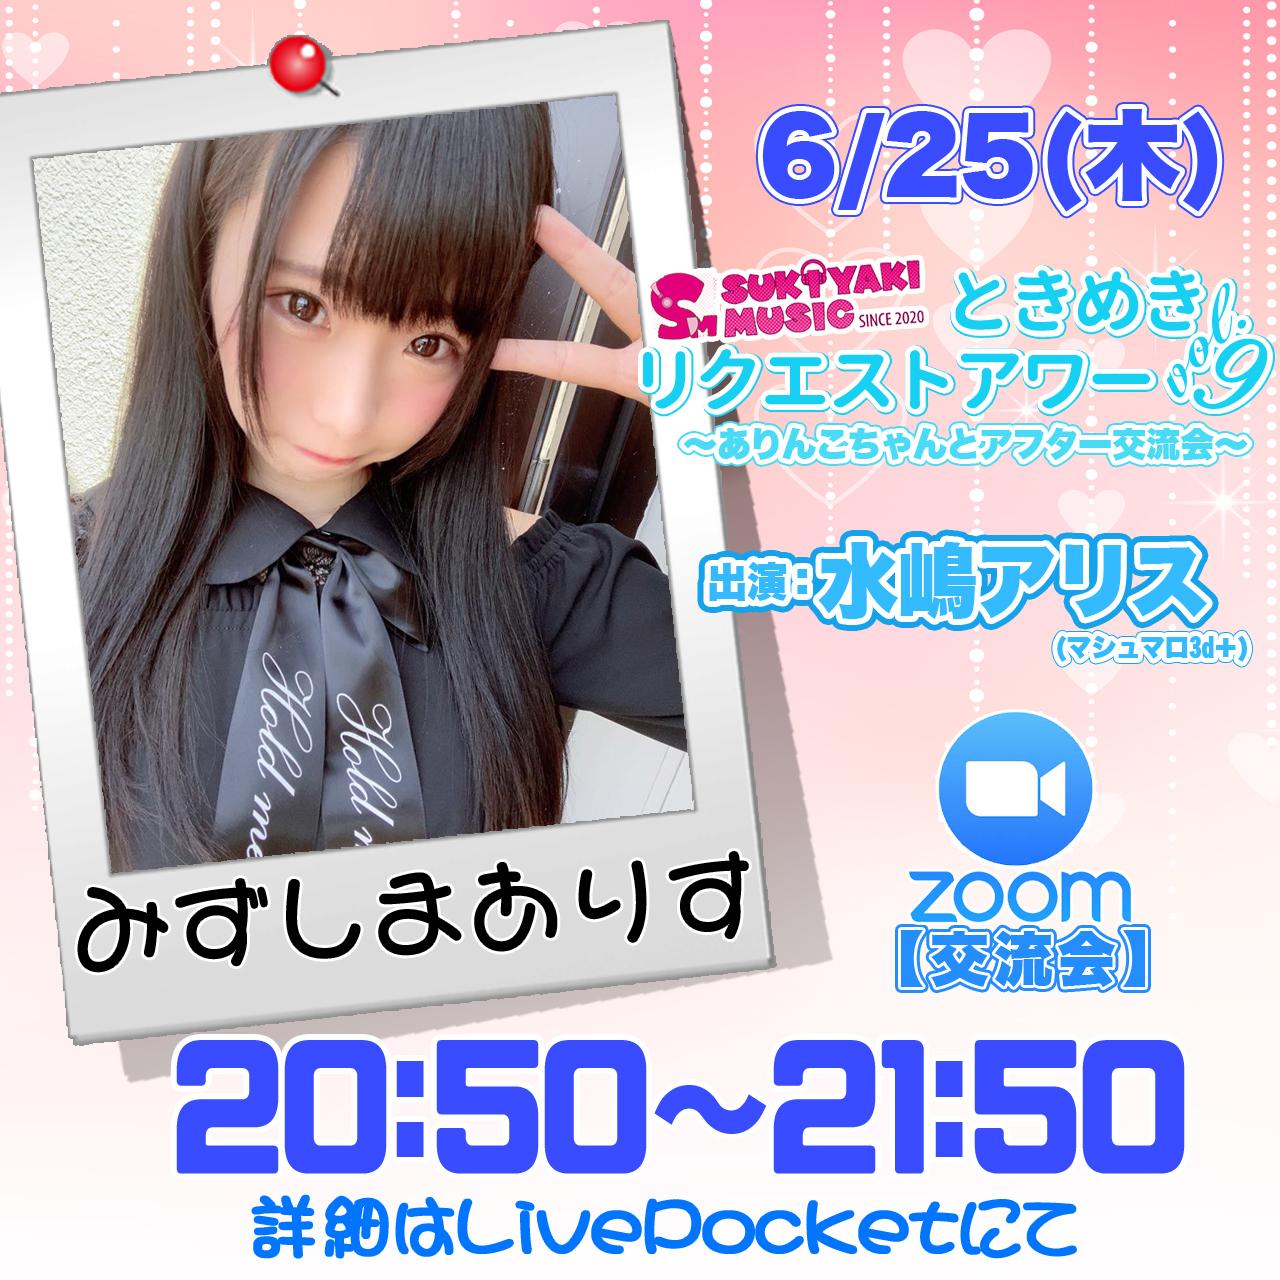 【Zoom交流会】 SUKIYAKI MUSIC presents ときめきリクエストアワー vol,9  ~ありんこちゃんとアフター交流会~